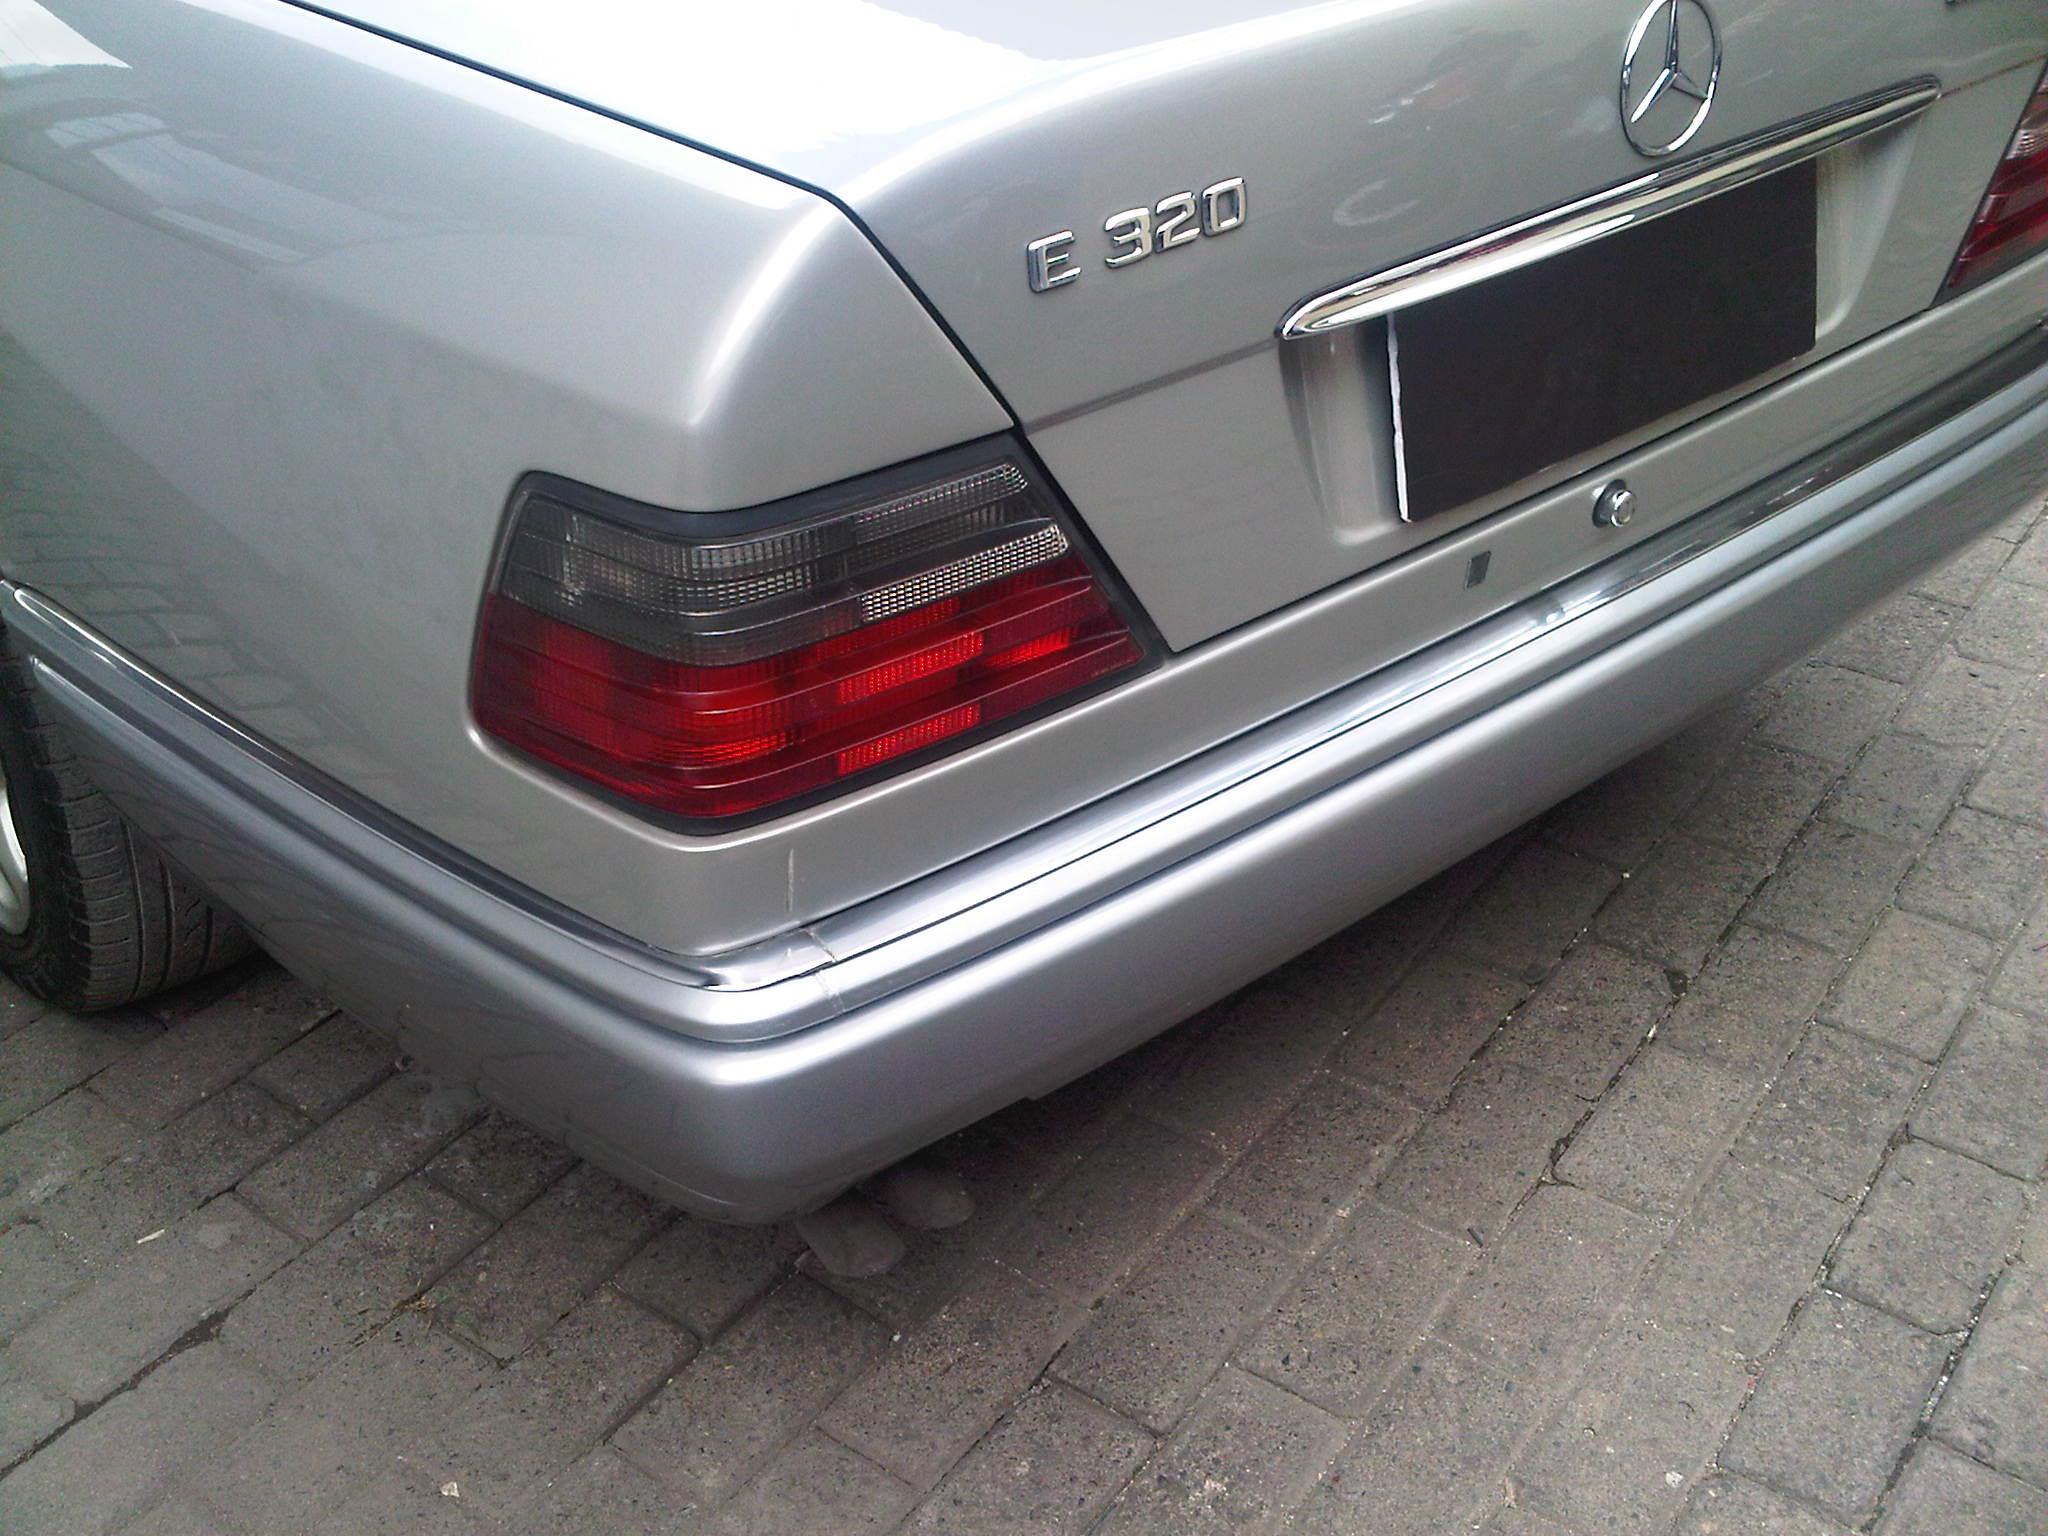 1995 mercedes benz e320 w124 garasi 64 for Mercedes benz bumper repair